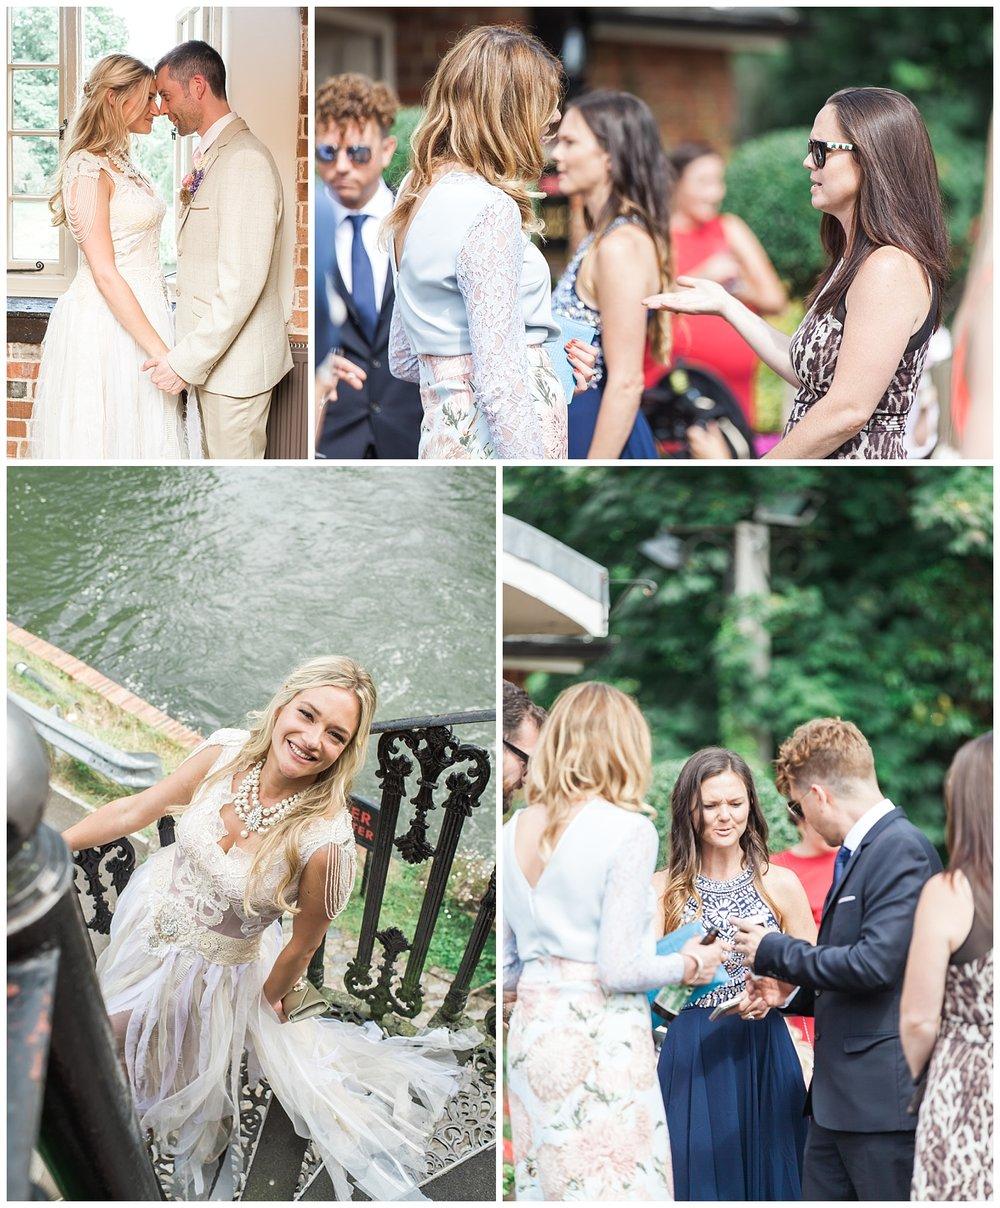 Emily and Allan Wedding 30.07.2016-610.jpg